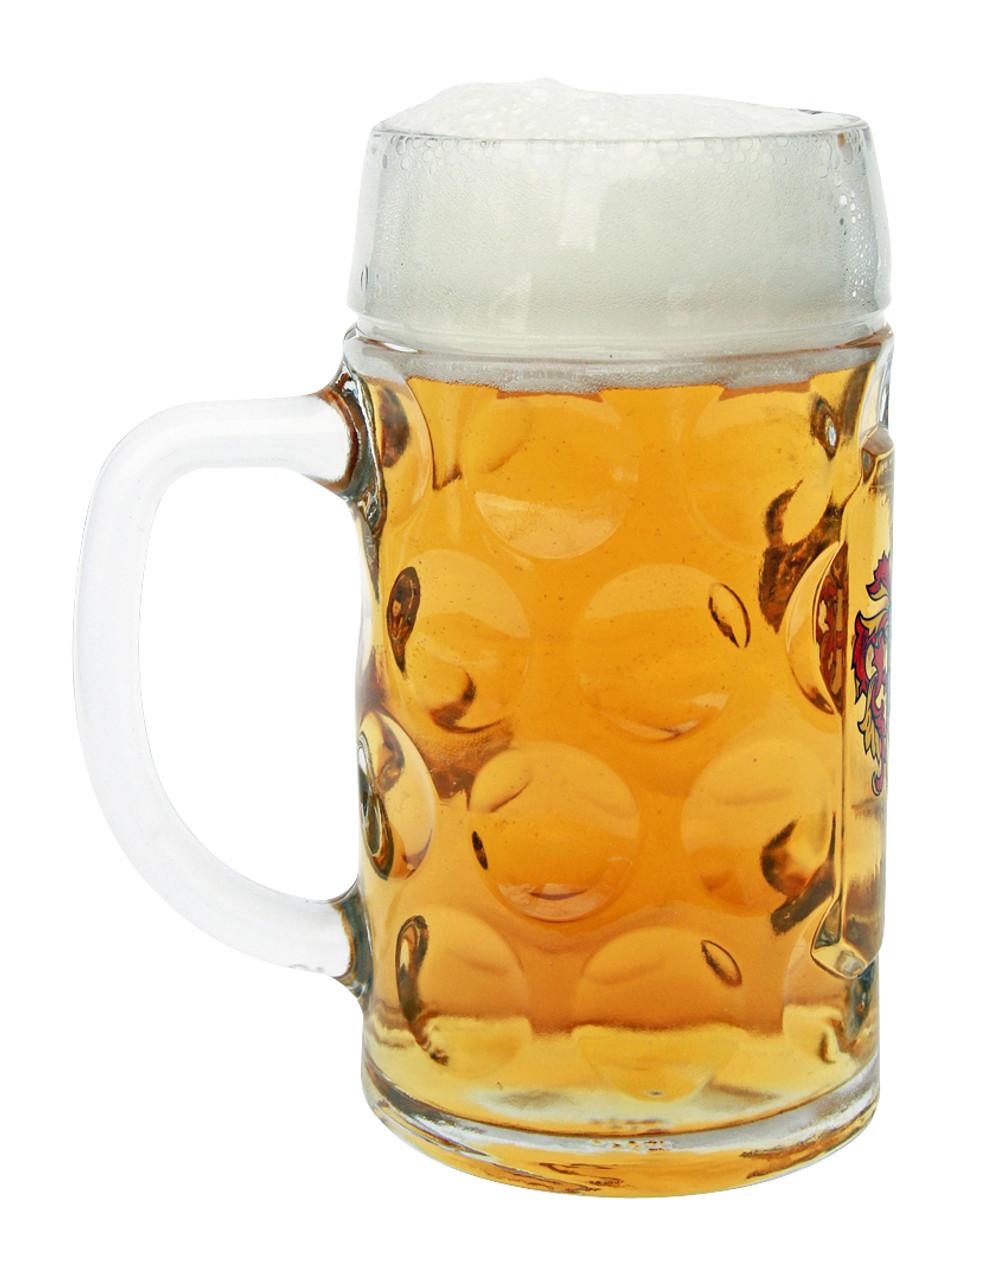 Authentic 0.5 Liter German Saarland Mass Krug with Beer